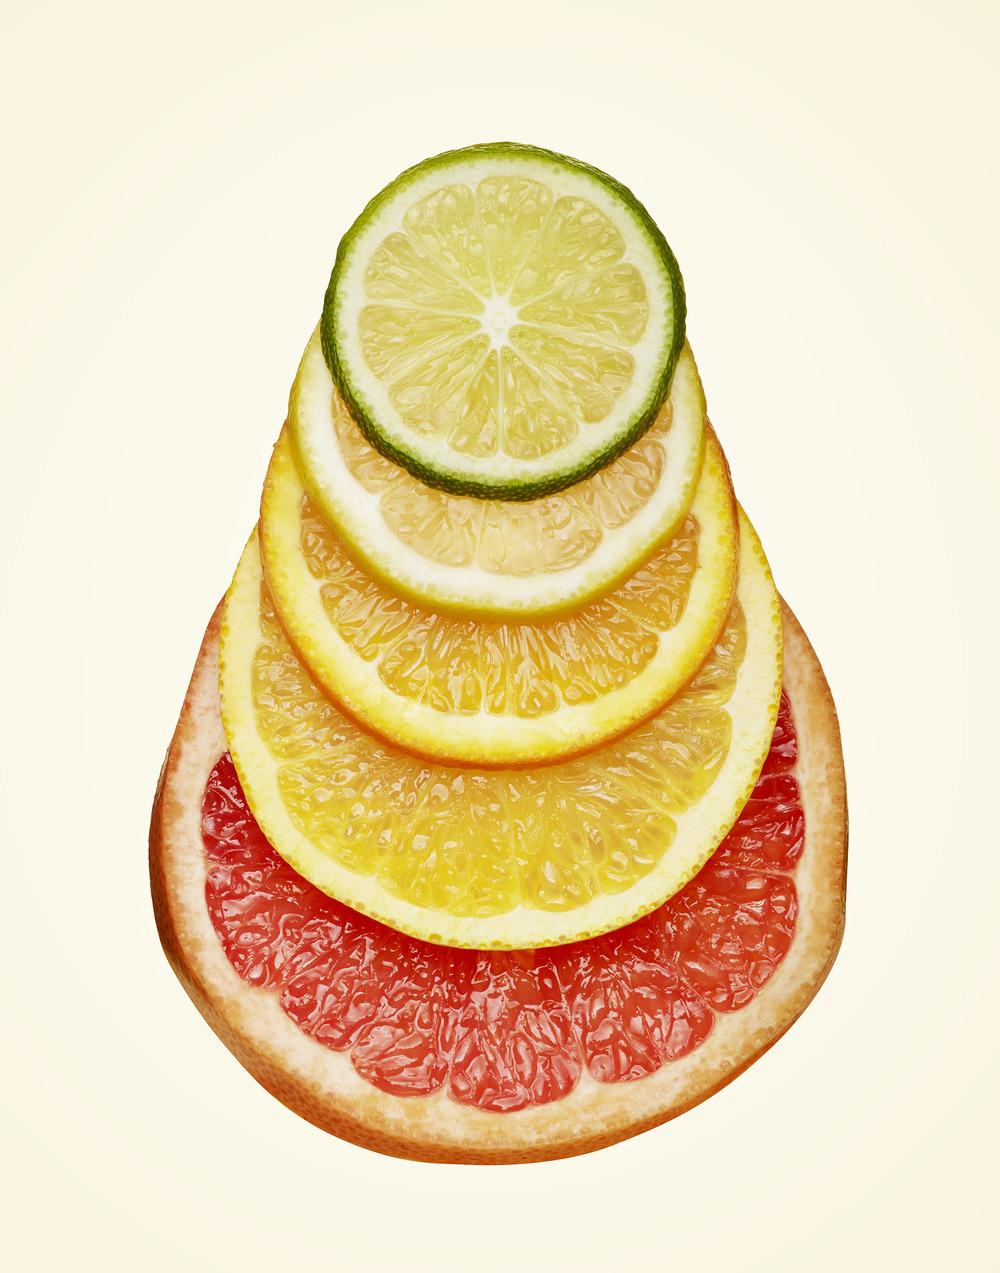 Citrus - Lime, Lemon, Orange, Grapefruit